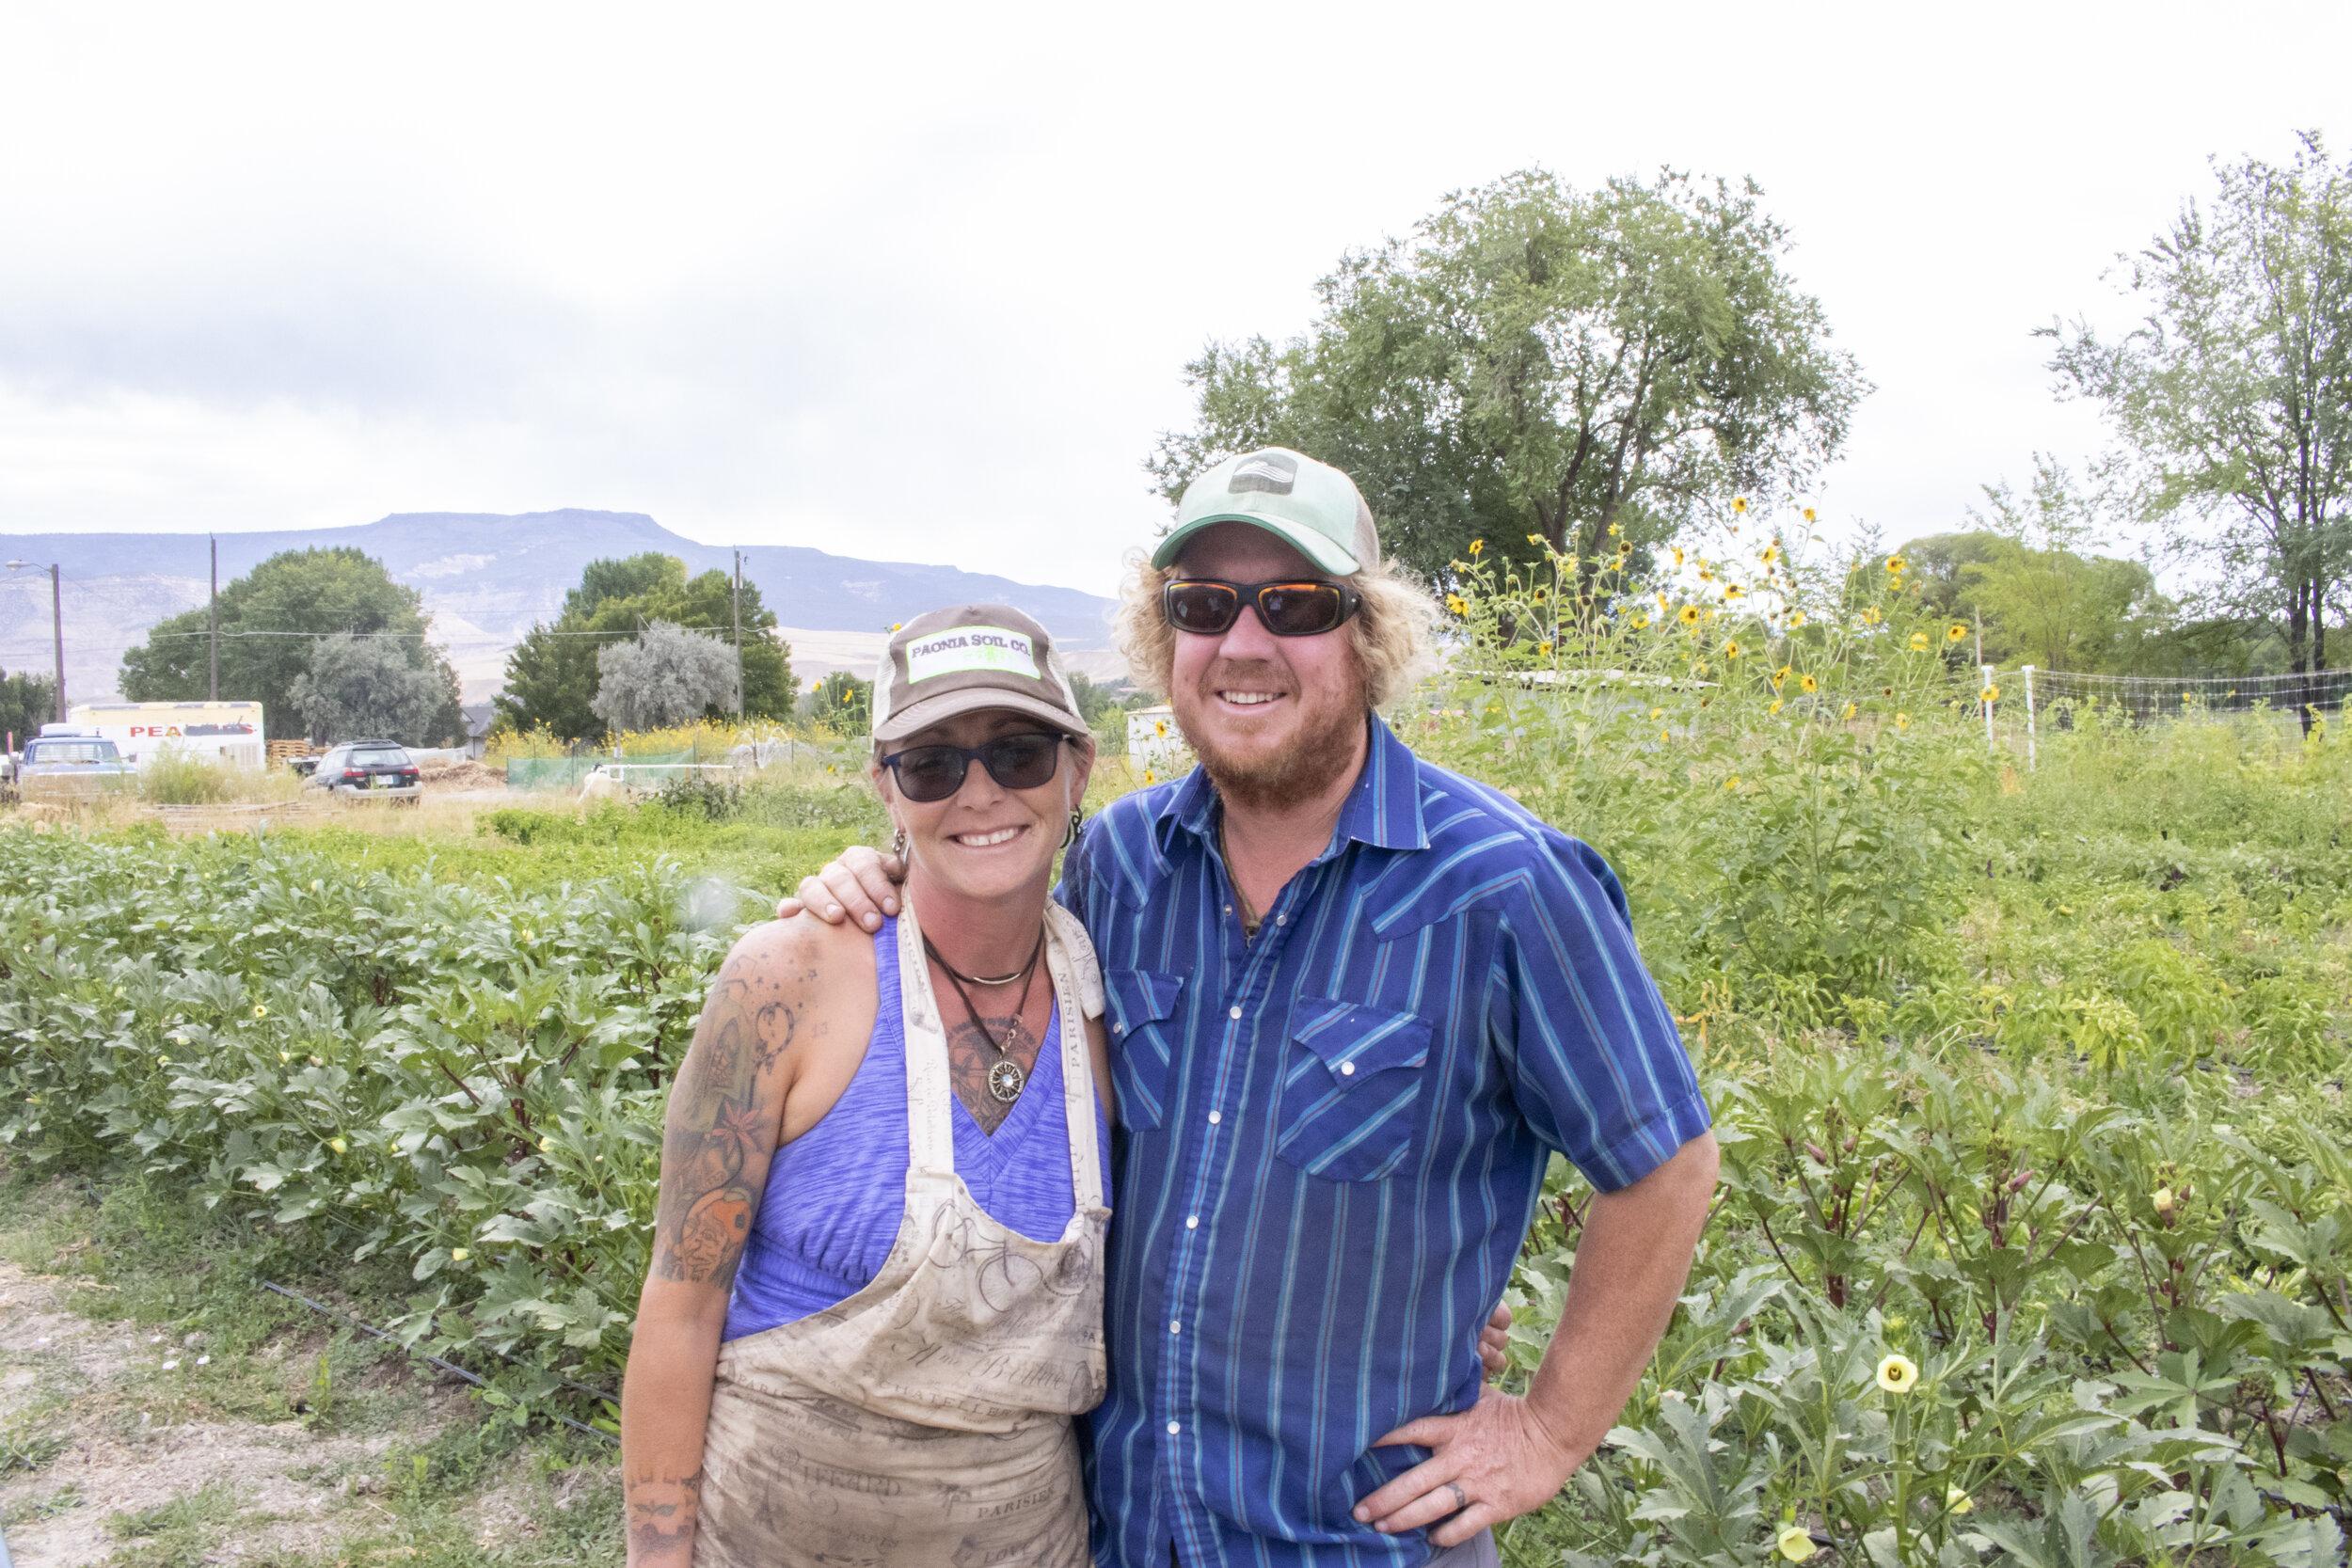 Dawn Trujillo and Brian Adams run Green Junction Farmstead in Clifton, Colorado.